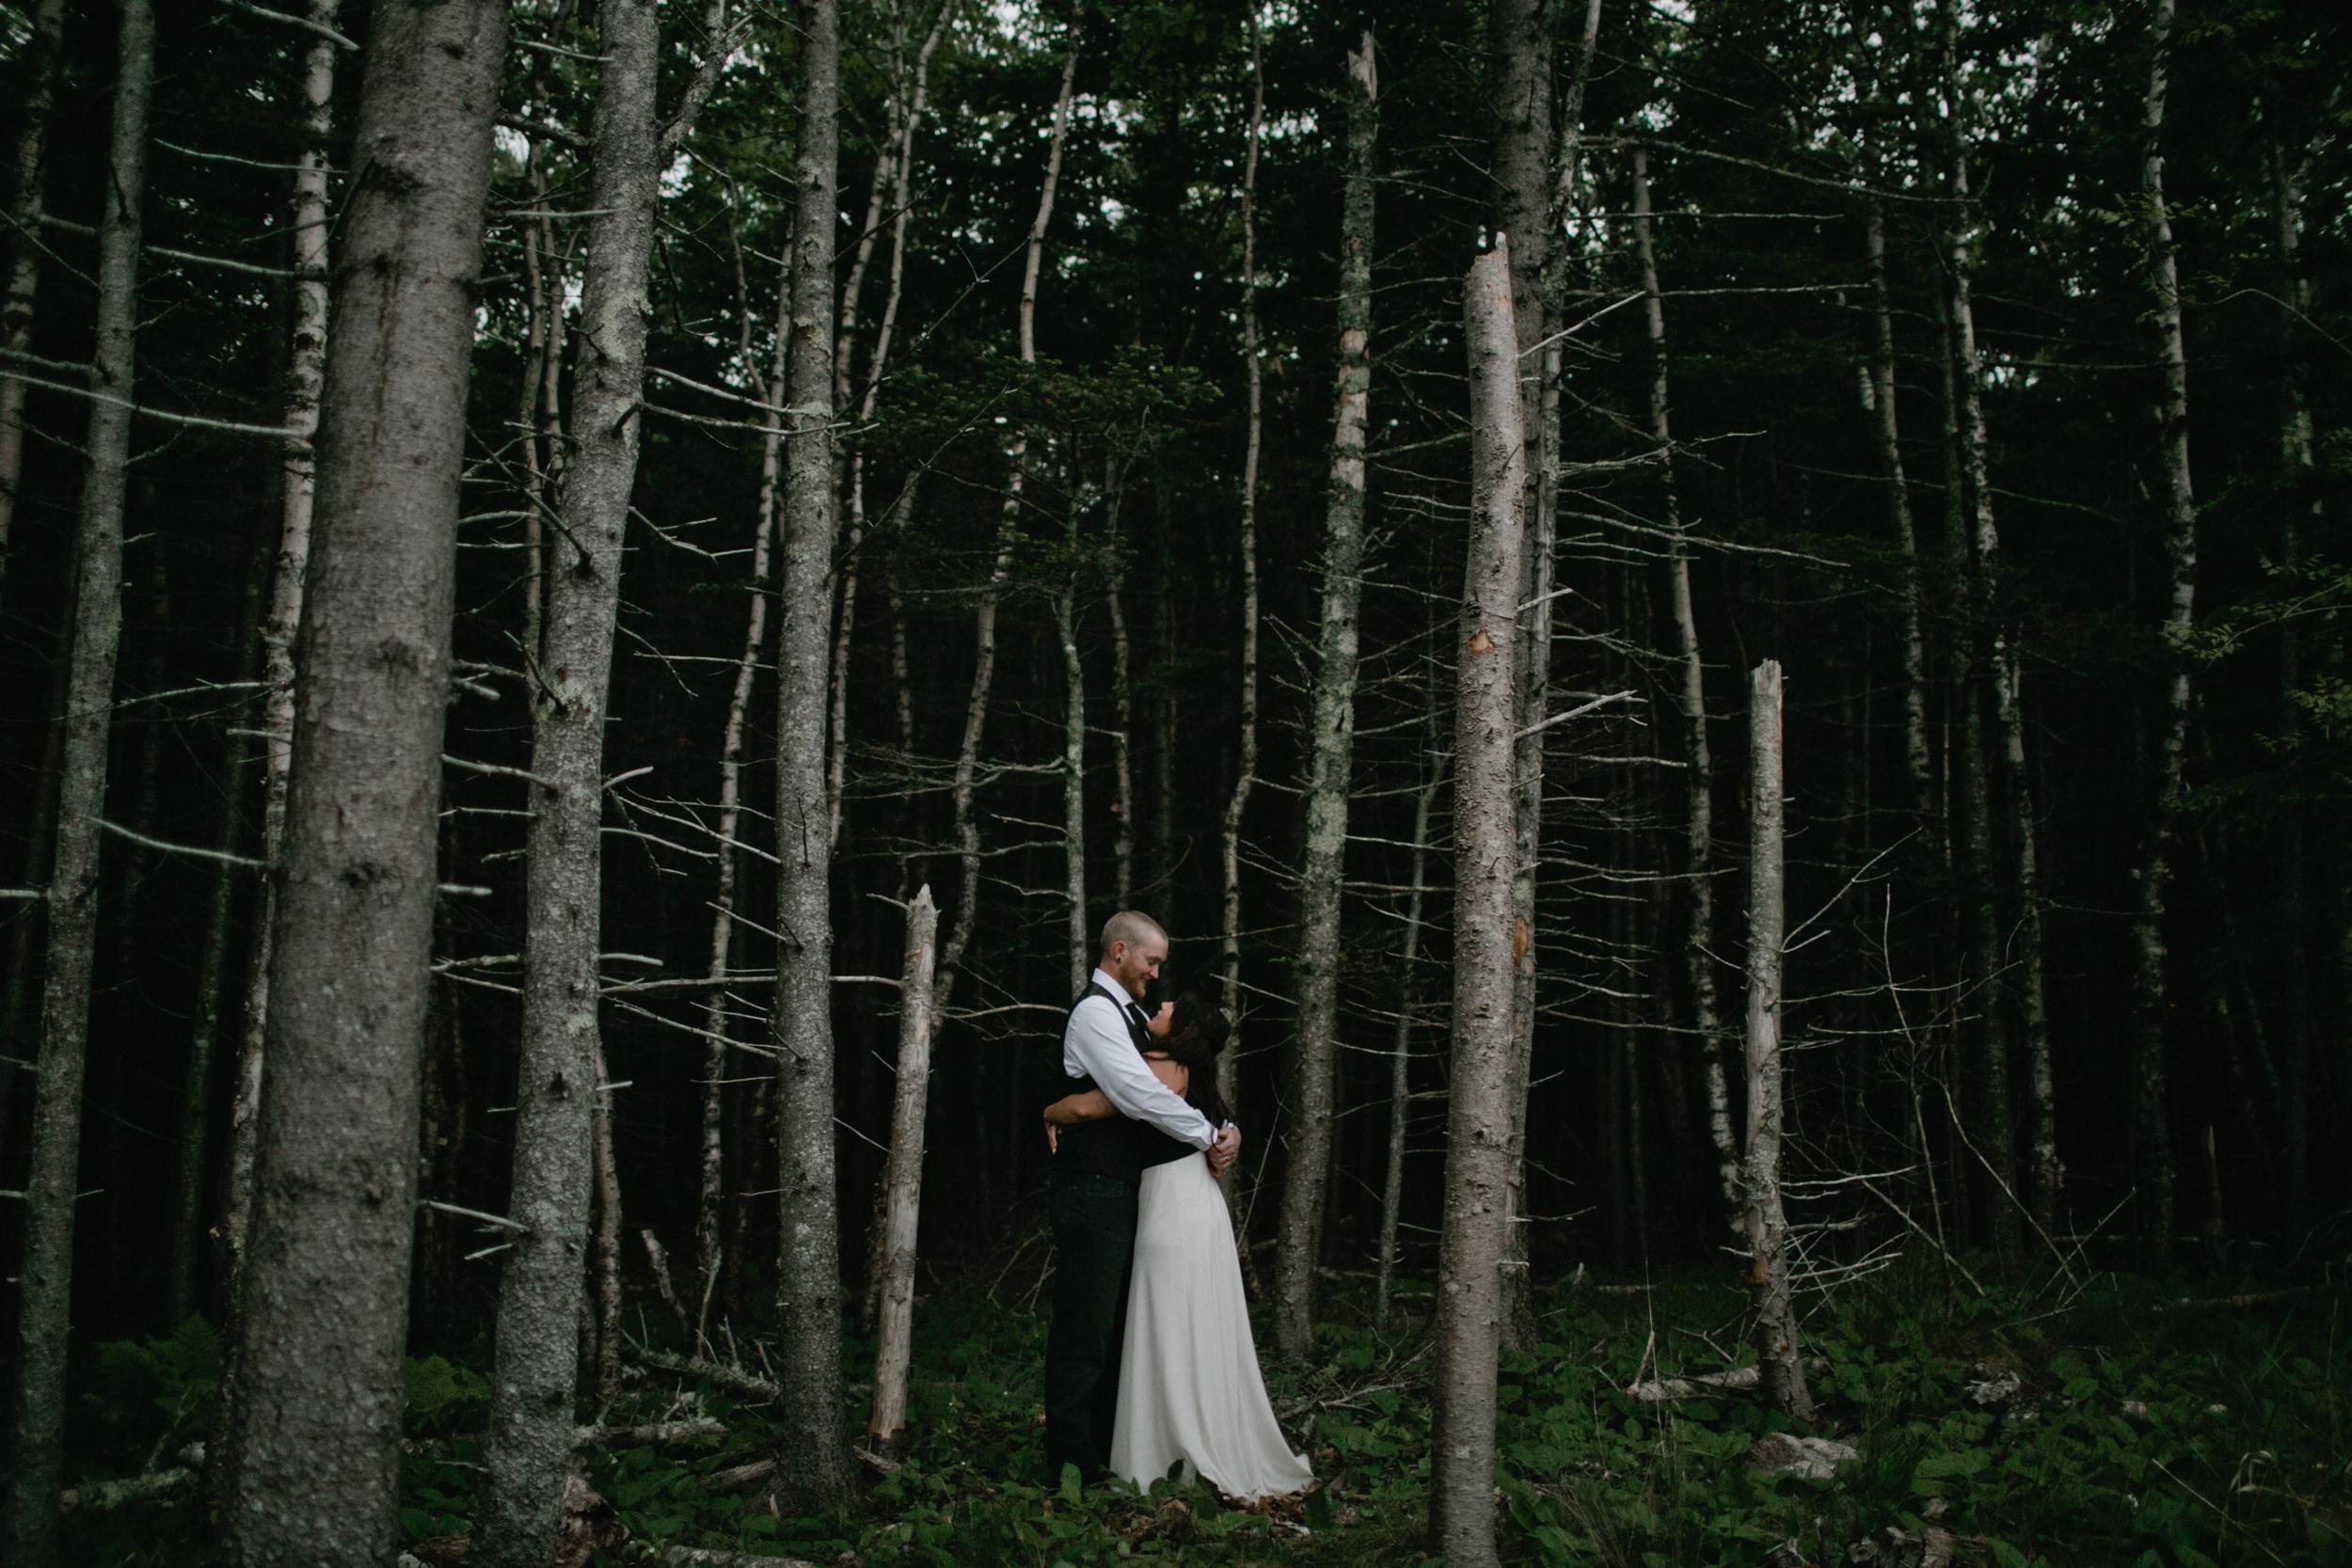 Acadia-National-Park-Elopement-71.jpg